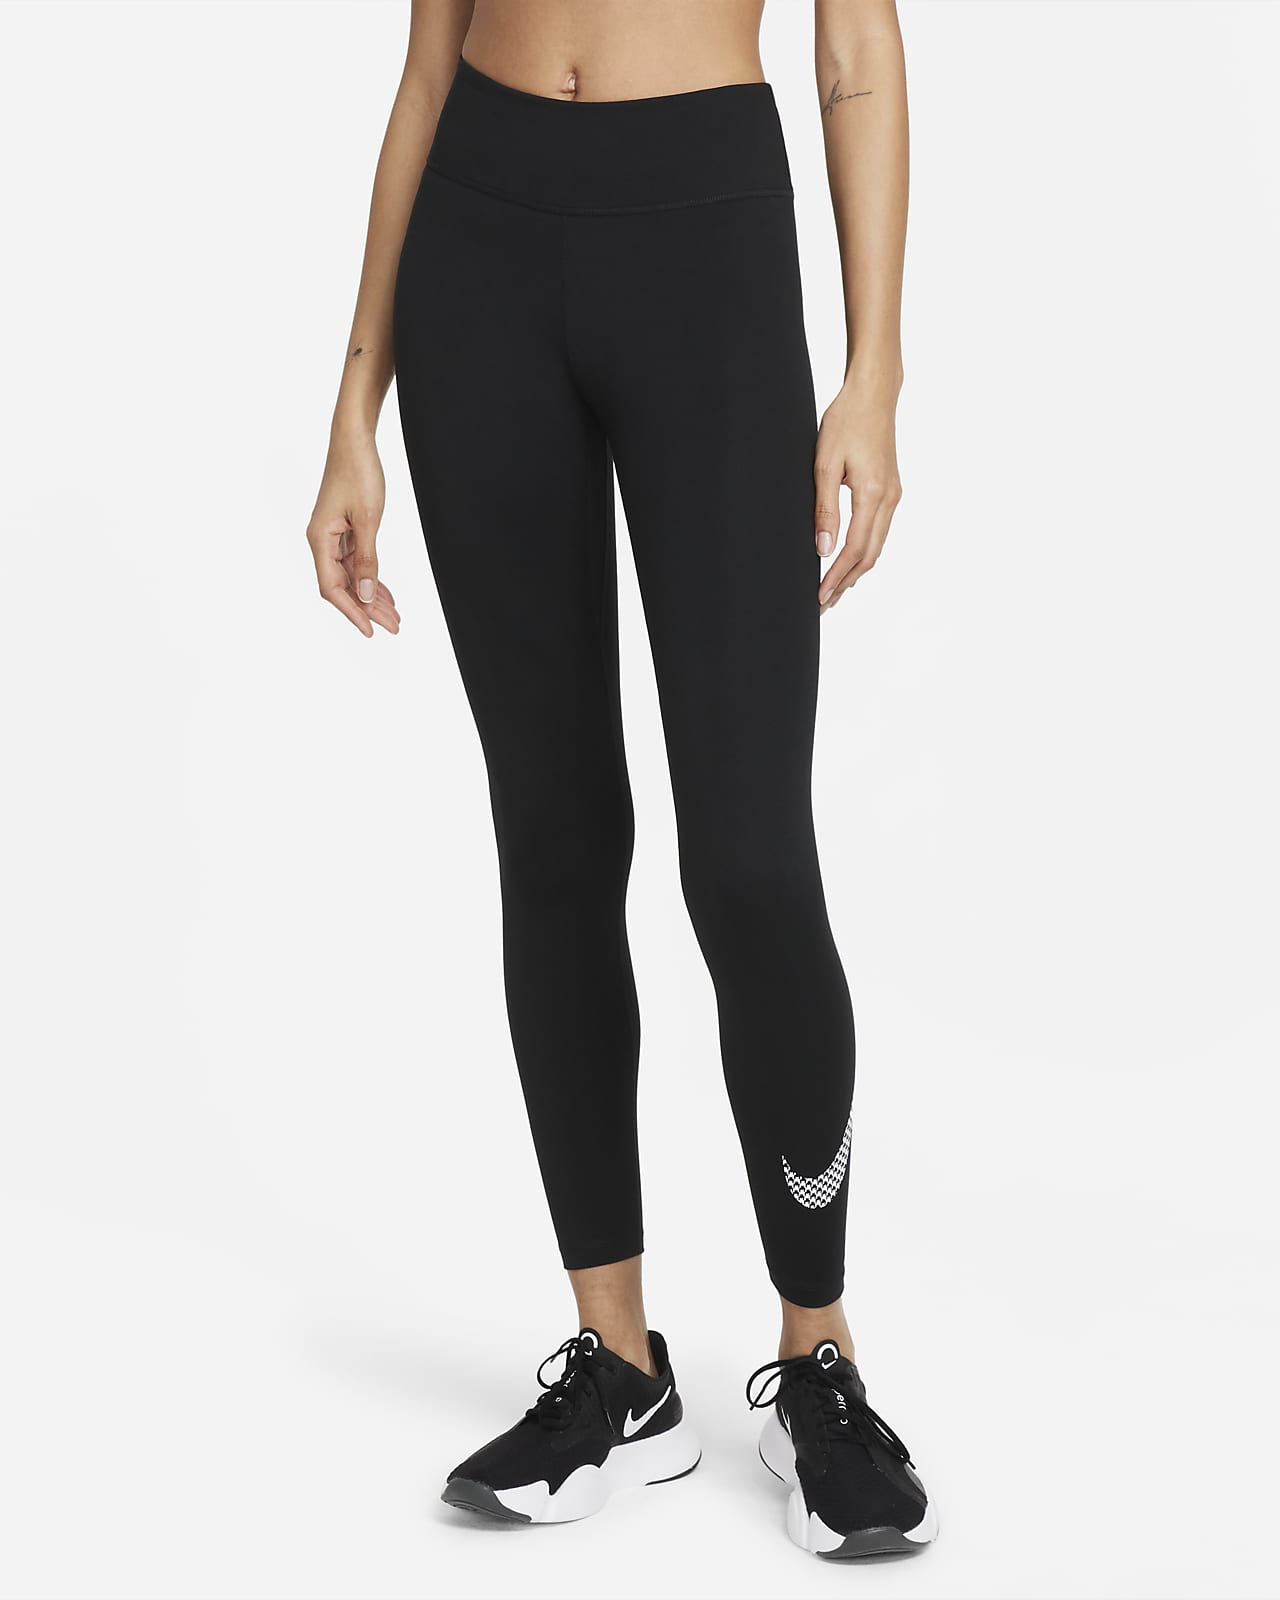 Nike Dri-FIT One Icon Clash Legging met halfhoge taille en graphic voor dames